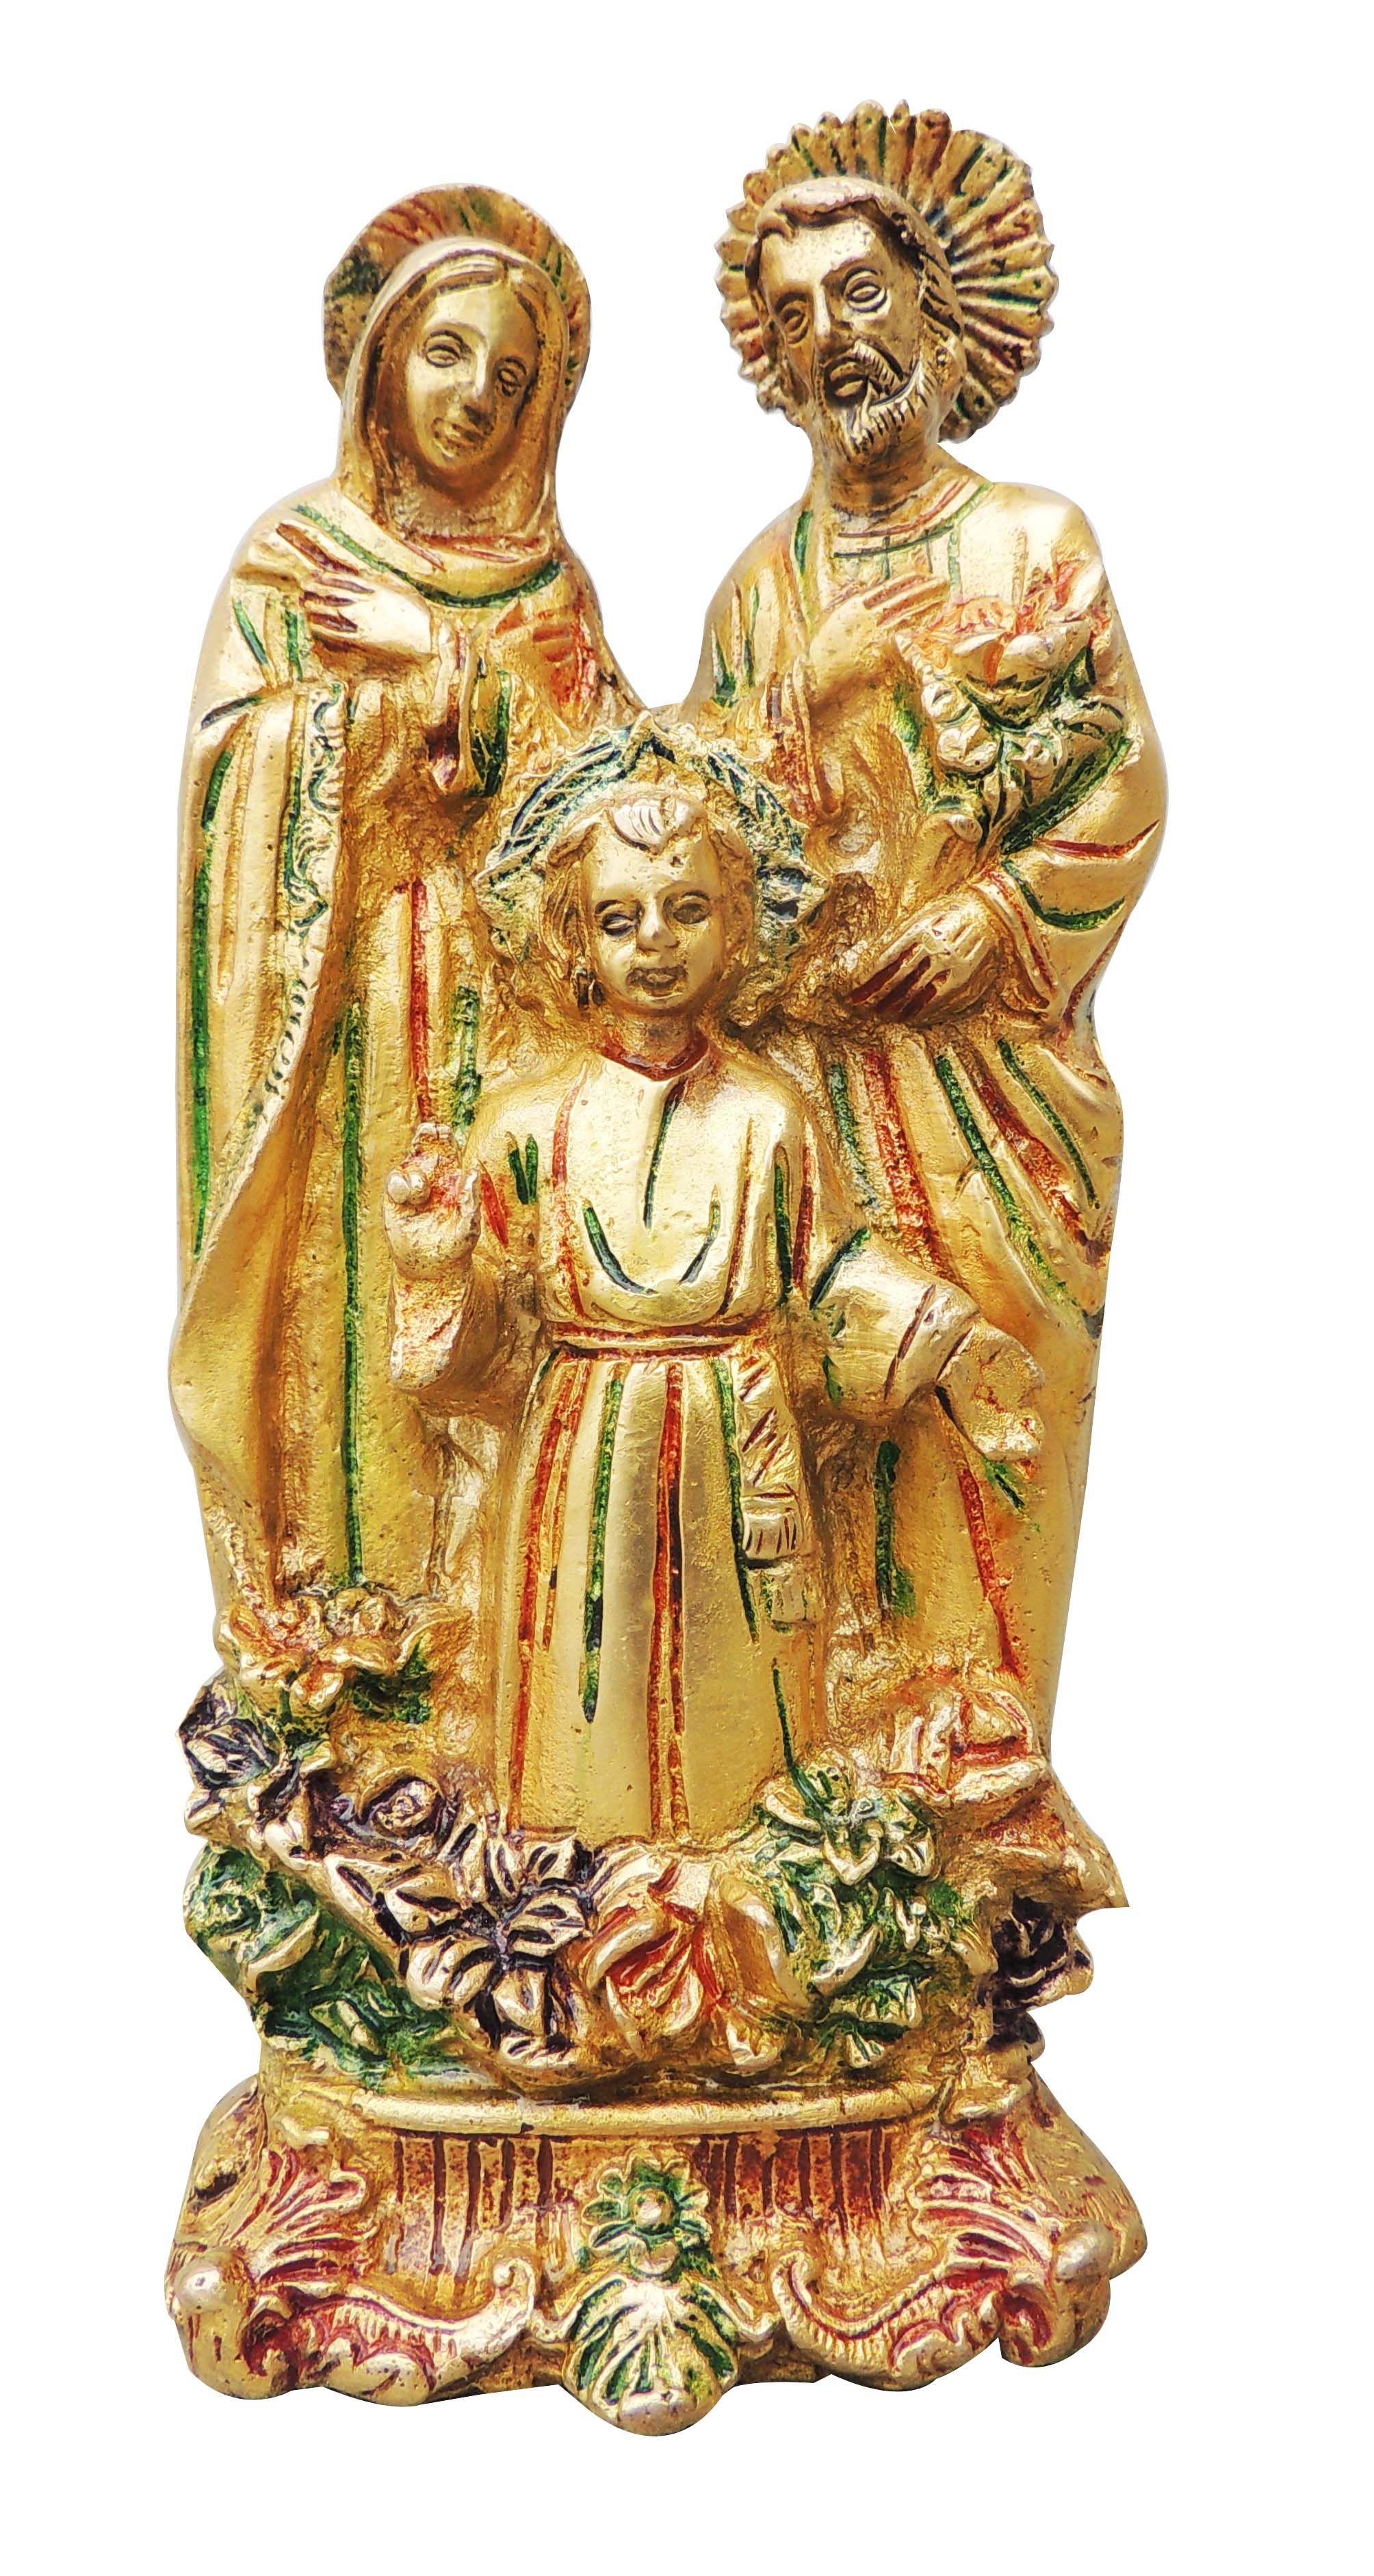 Brass Gift Center Jesus Brass Idol